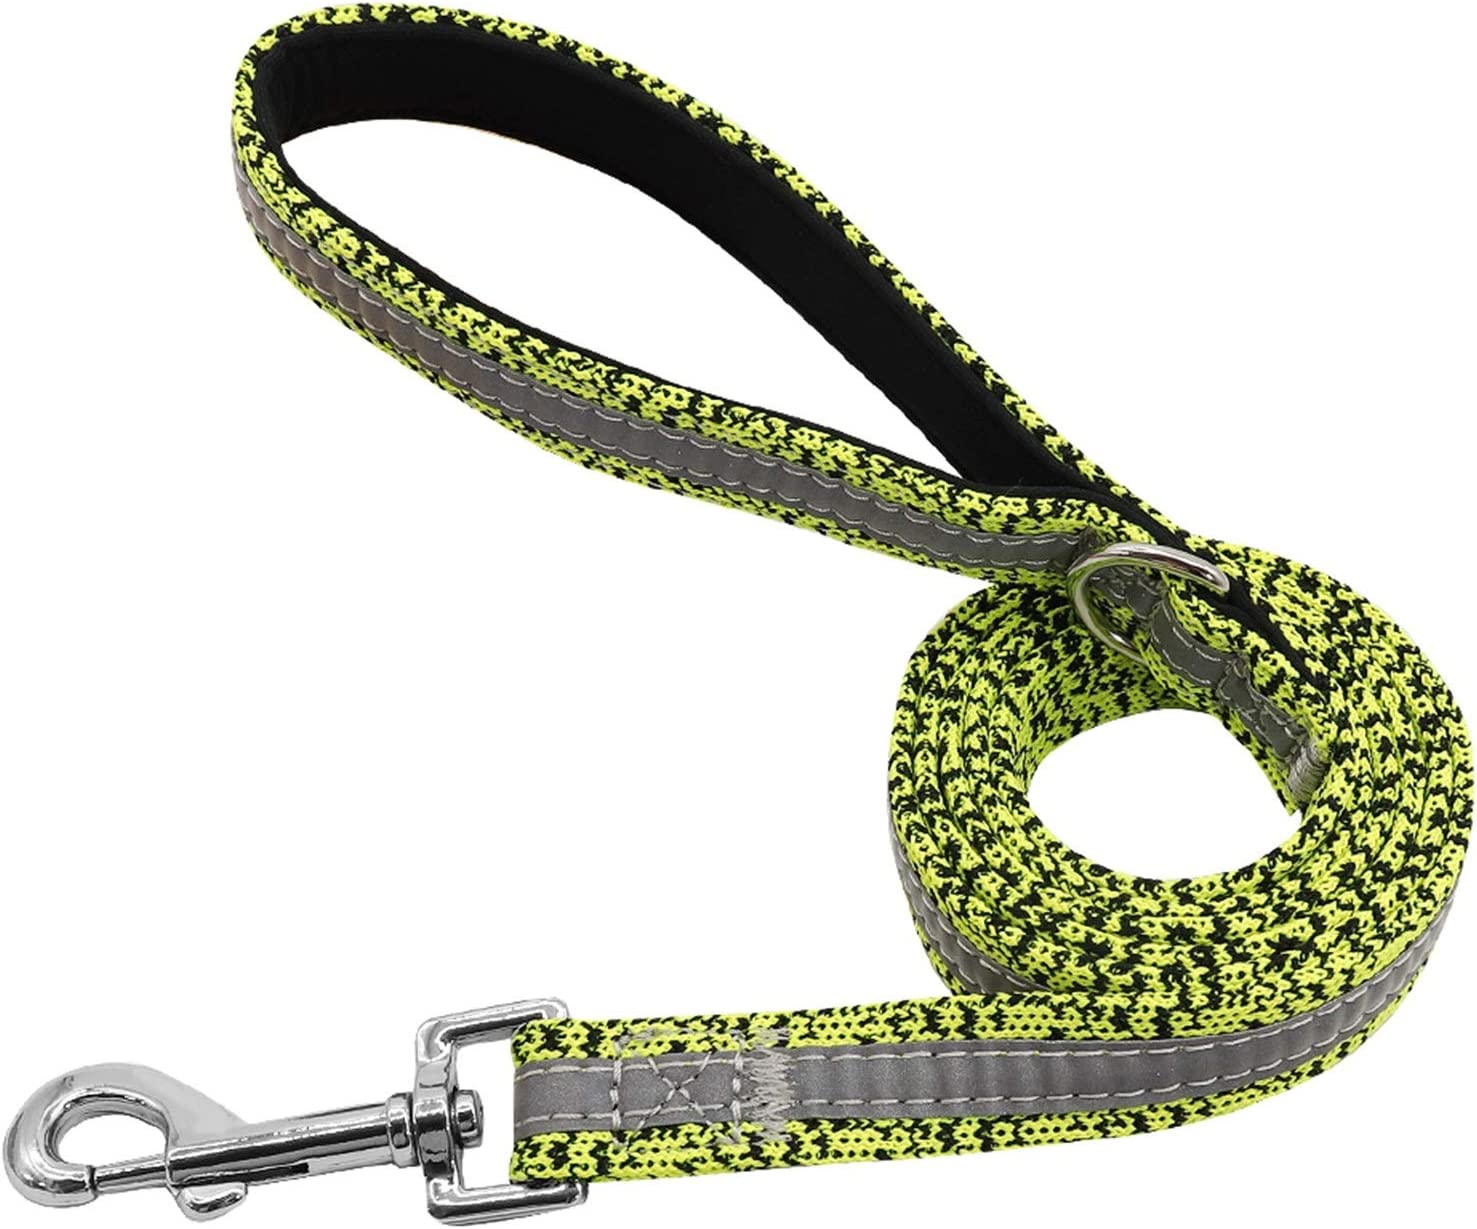 Pet Traction Rope Nylon Max 83% OFF Dog Reflective Rare Leash Walking Ru Lead